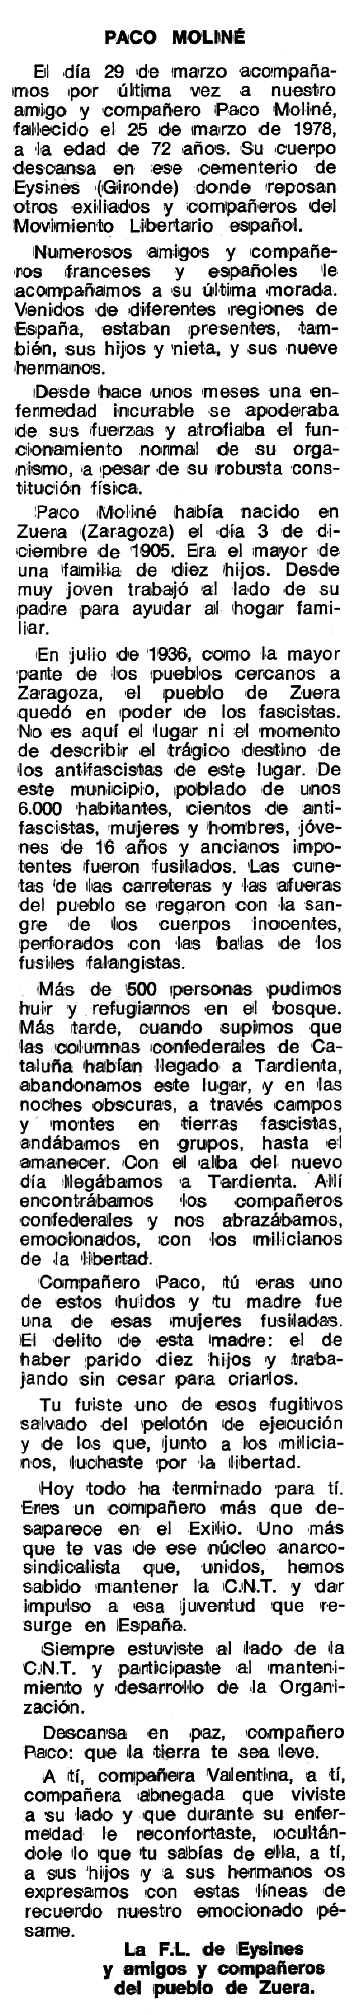 "Necrològica de Francisco Moliné Viñas publicada en el periòdic tolosà ""Espoir"" del 12 de juny de 1978"